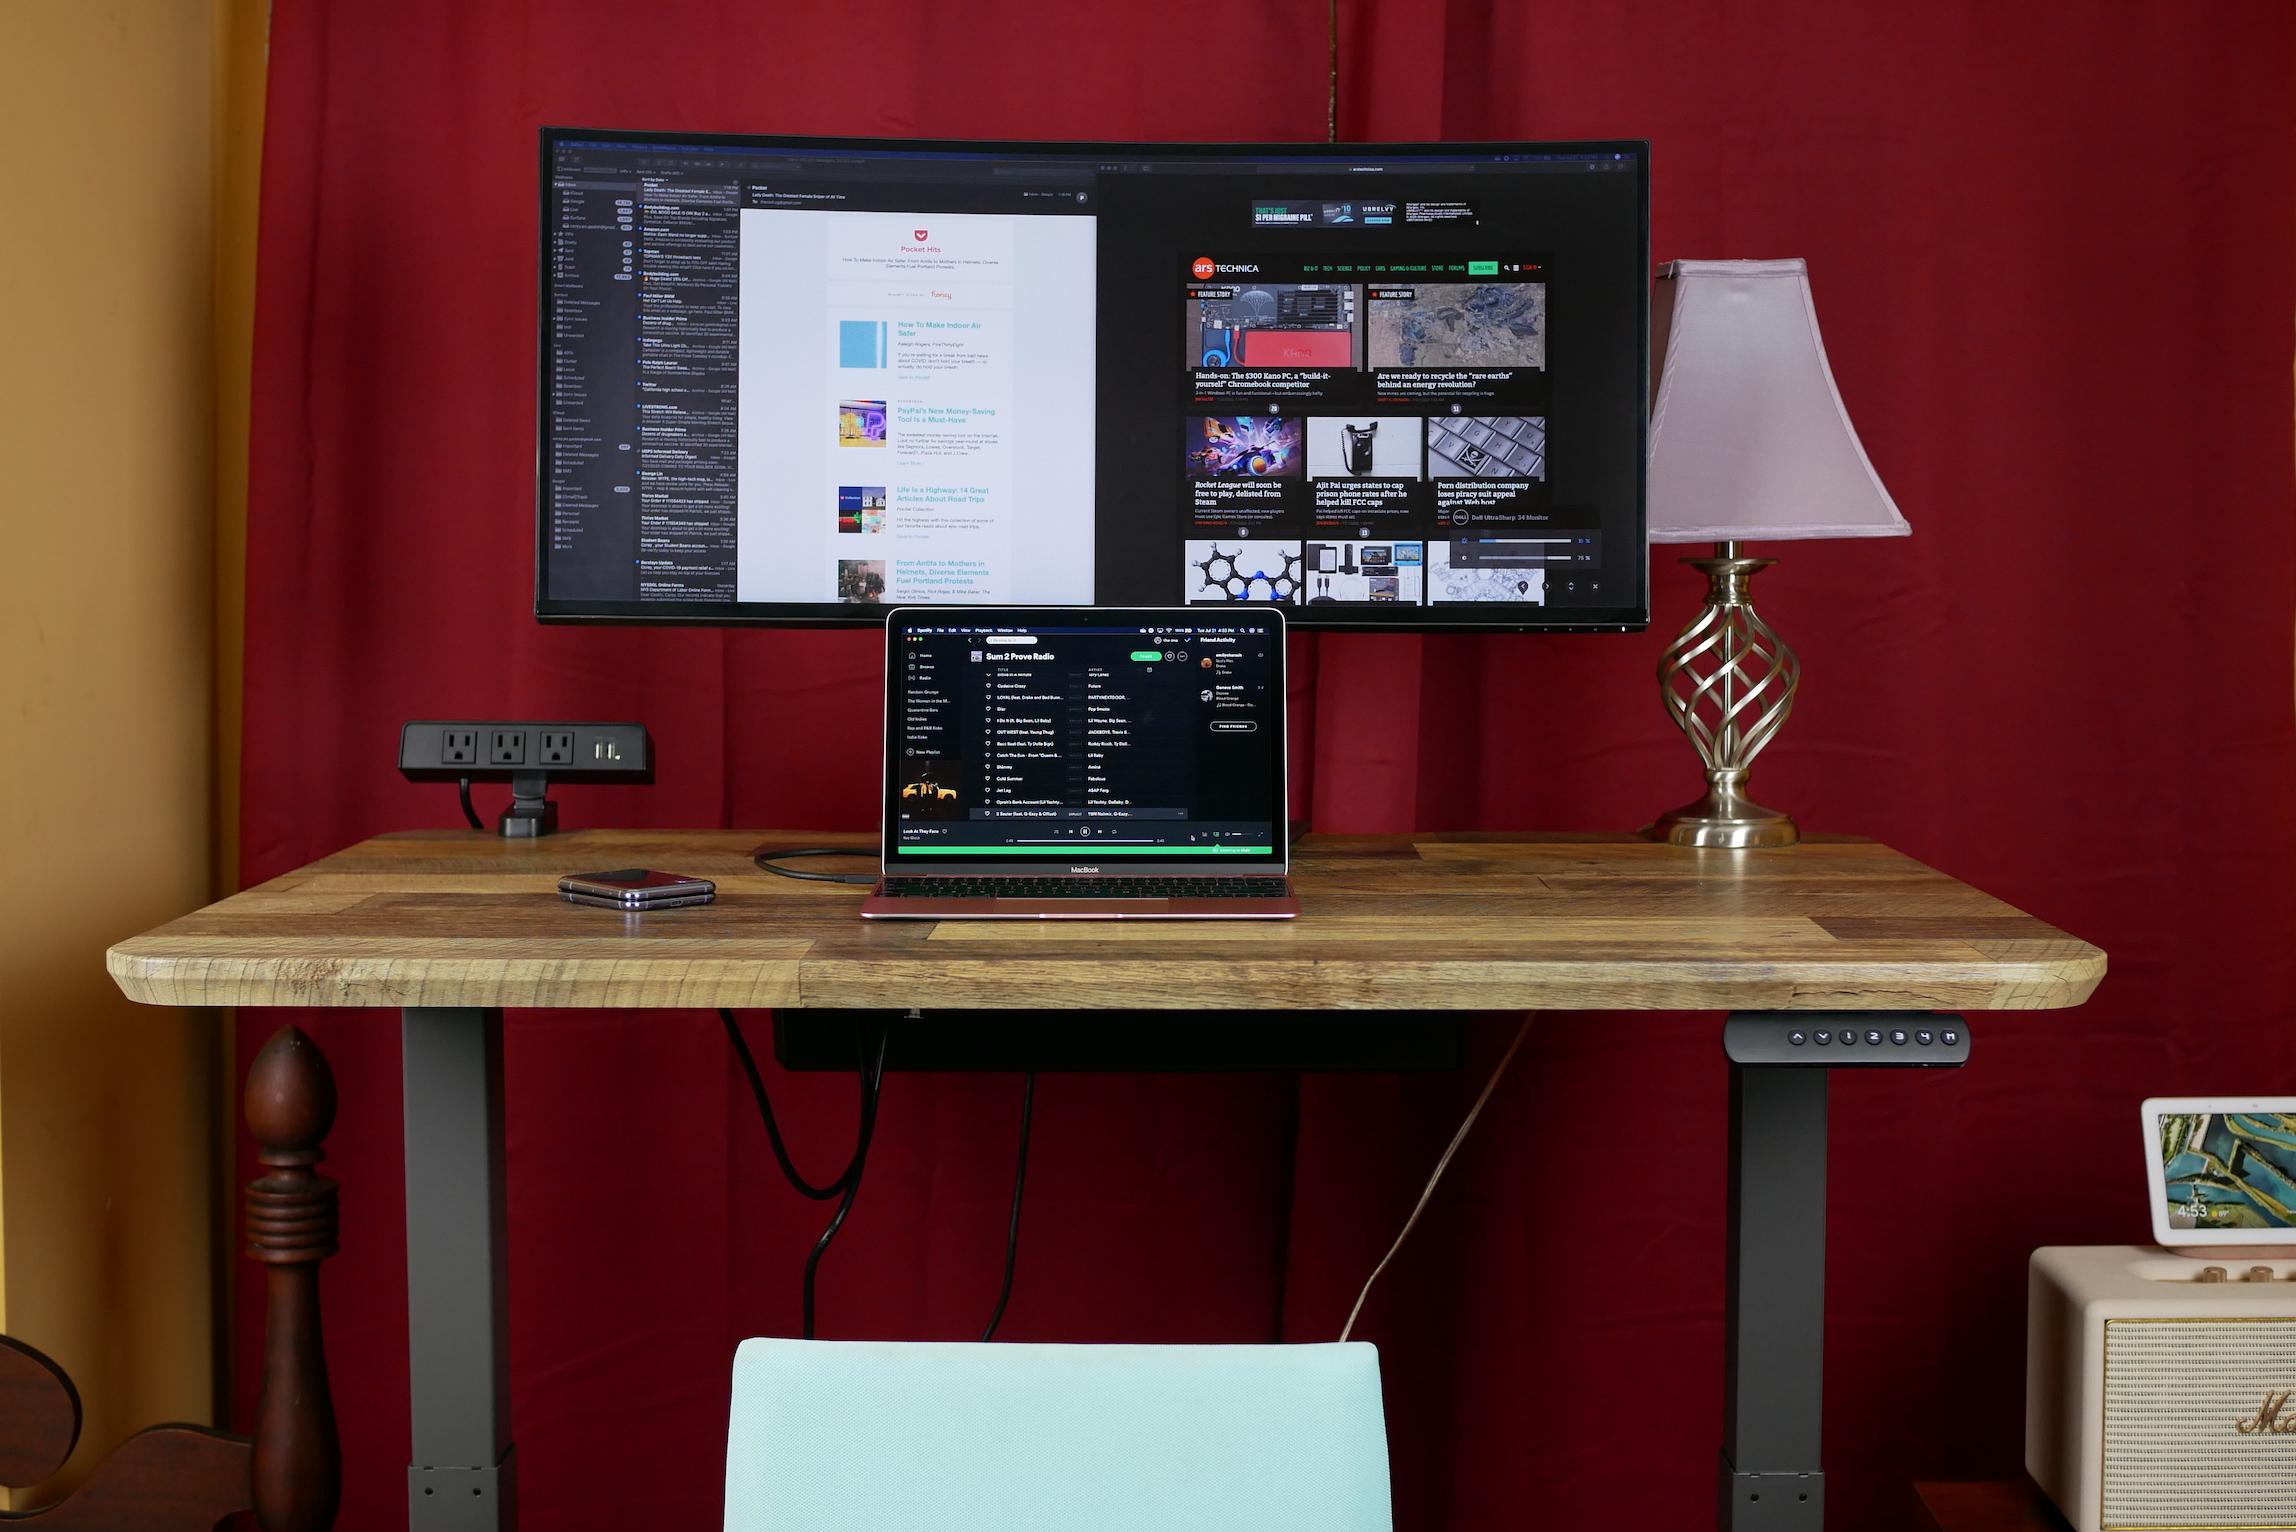 Dell's UltraSharp 34 monitor.